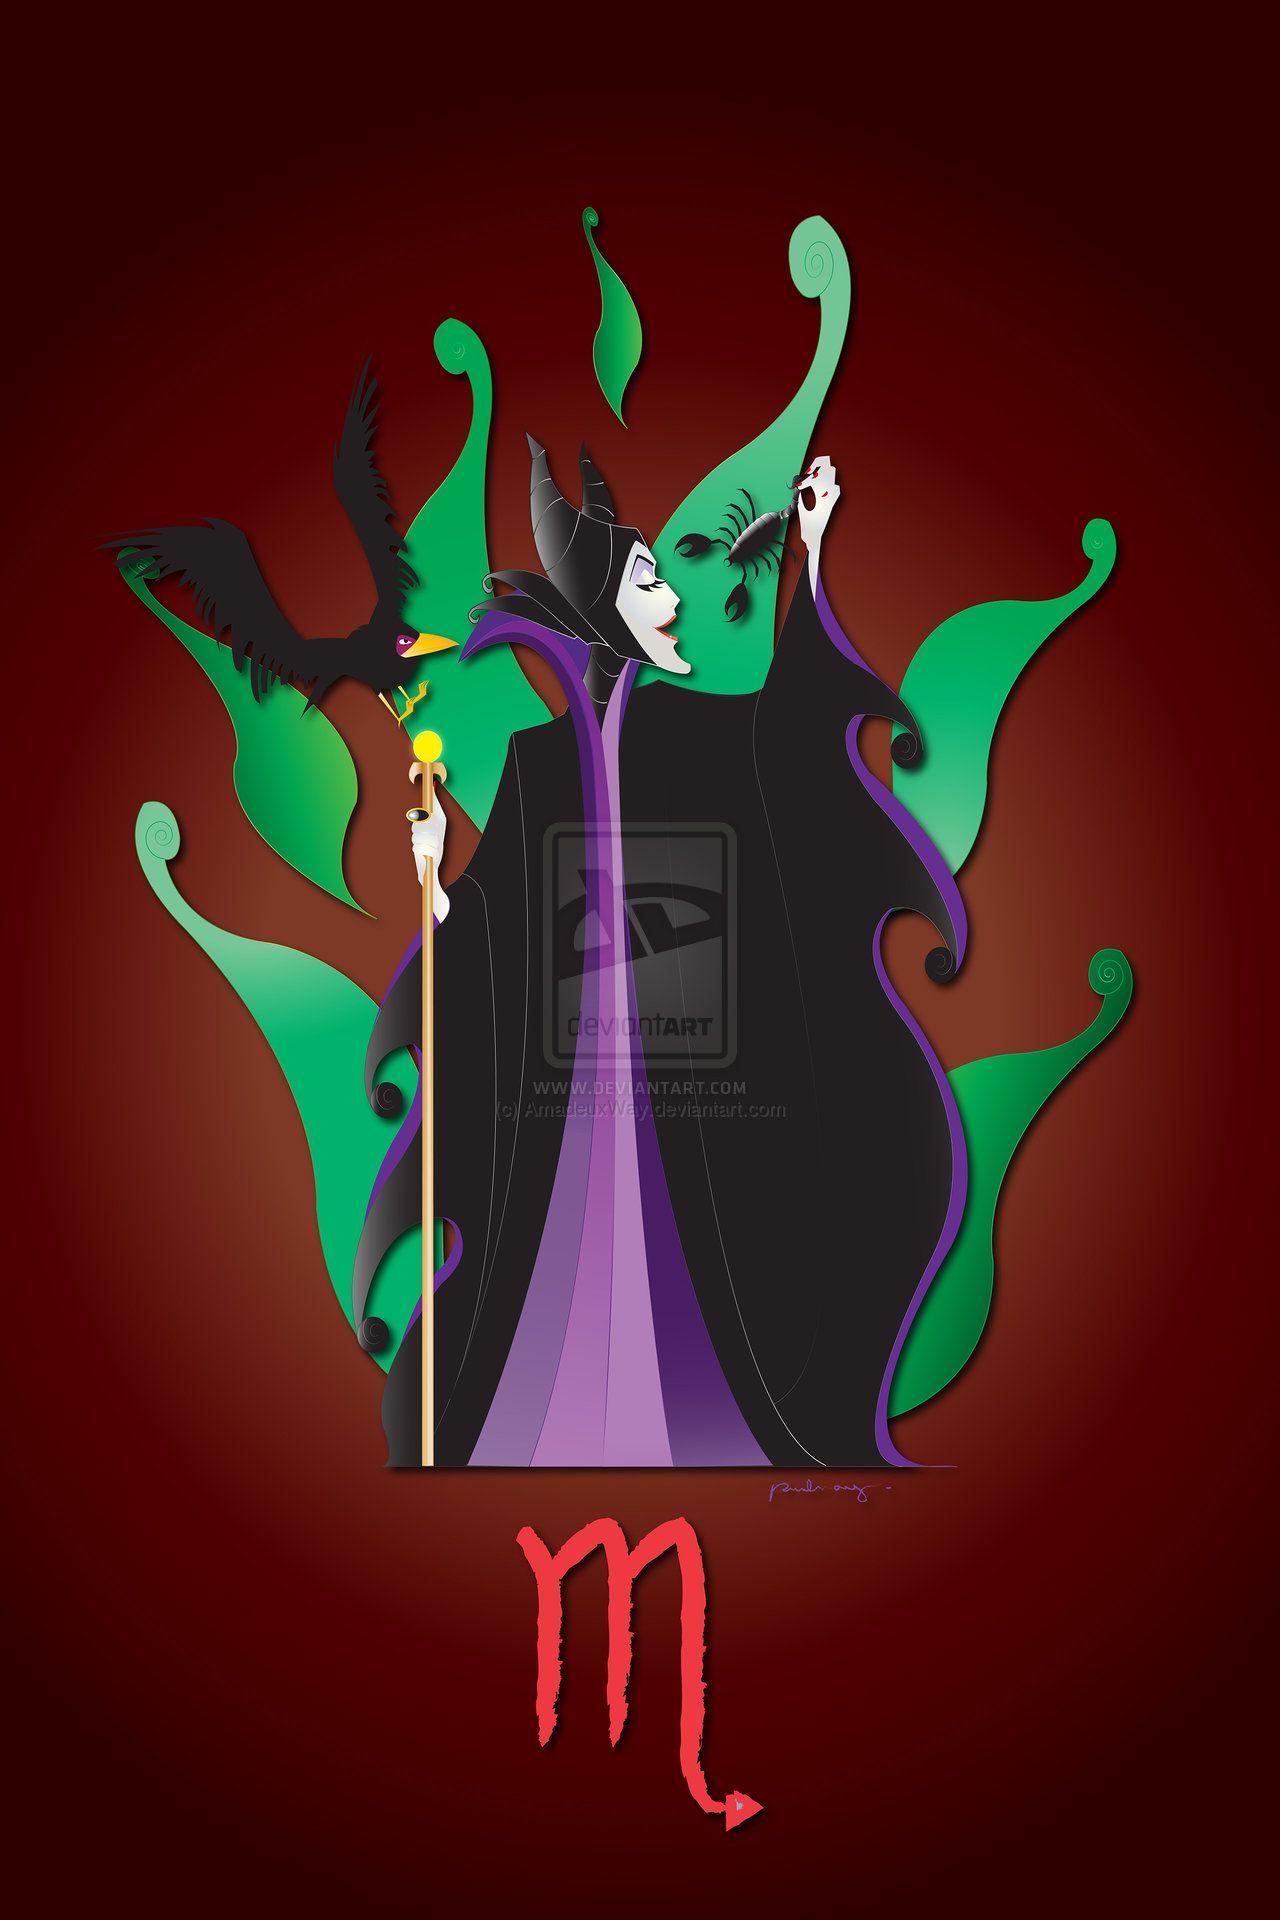 Scorpio+-+Maleficent+by+AmadeuxWay.deviantart.com+on+@DeviantArt